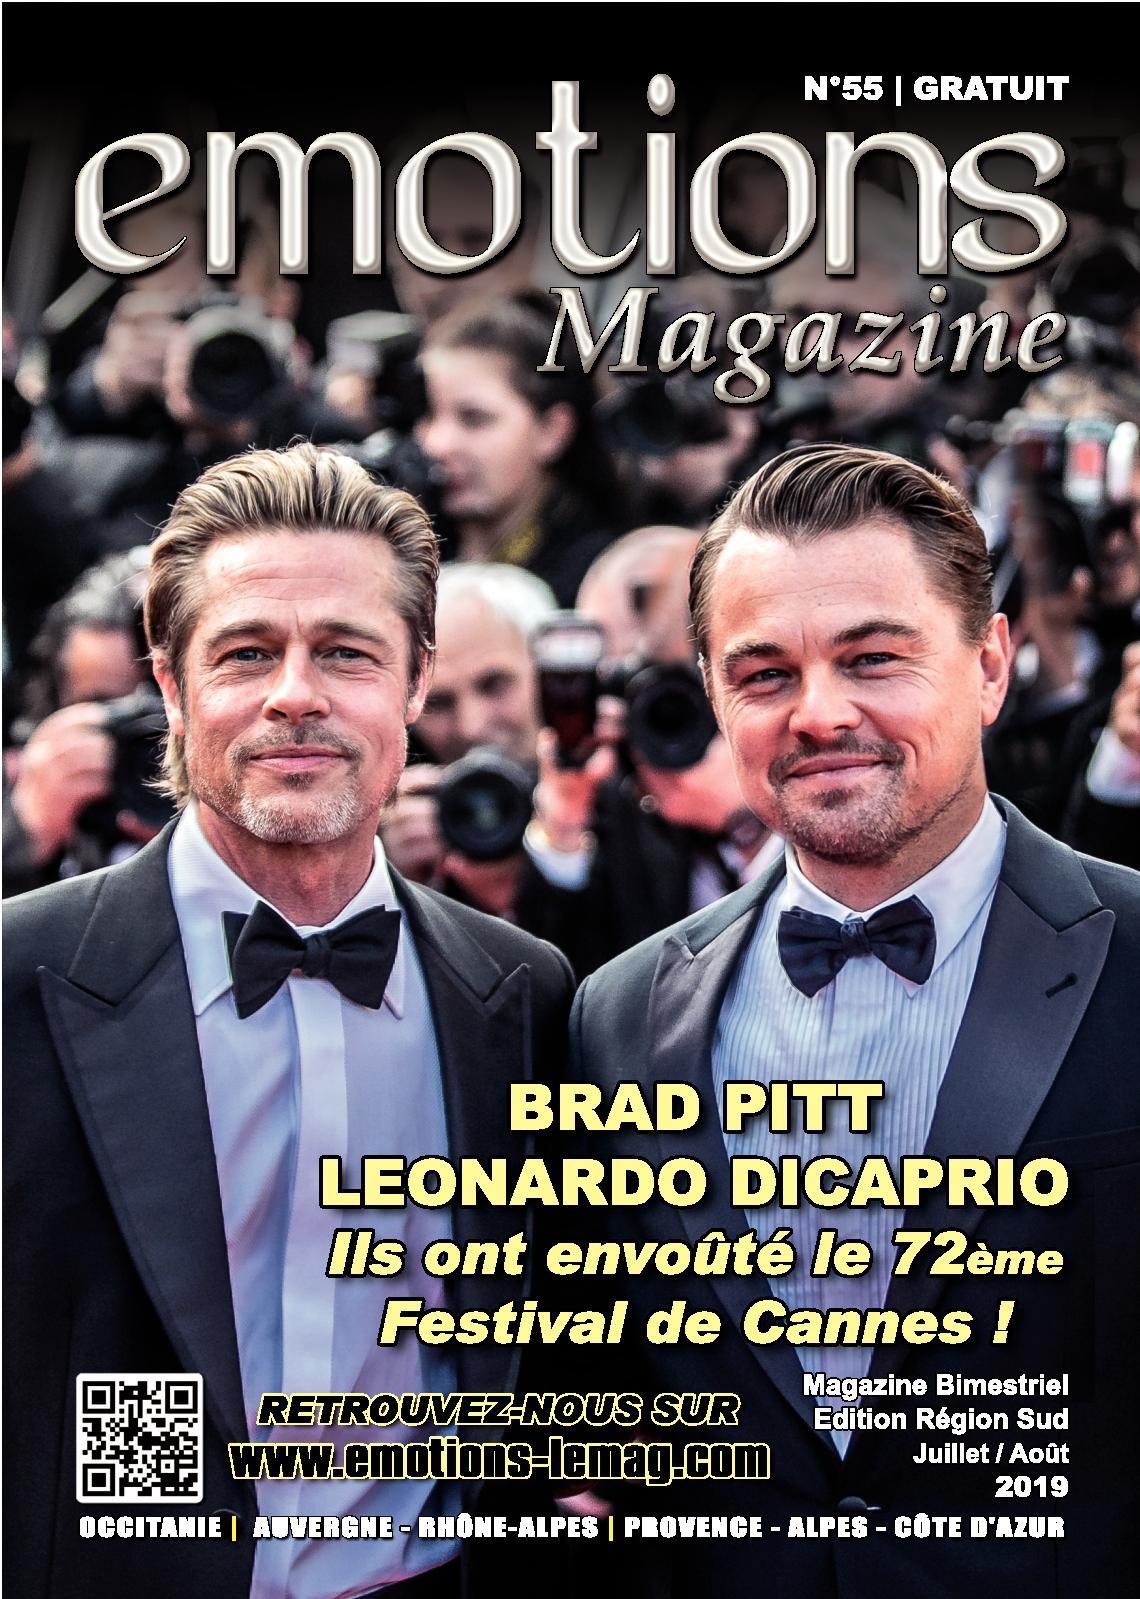 Leonardo DiCaprio datant 2013